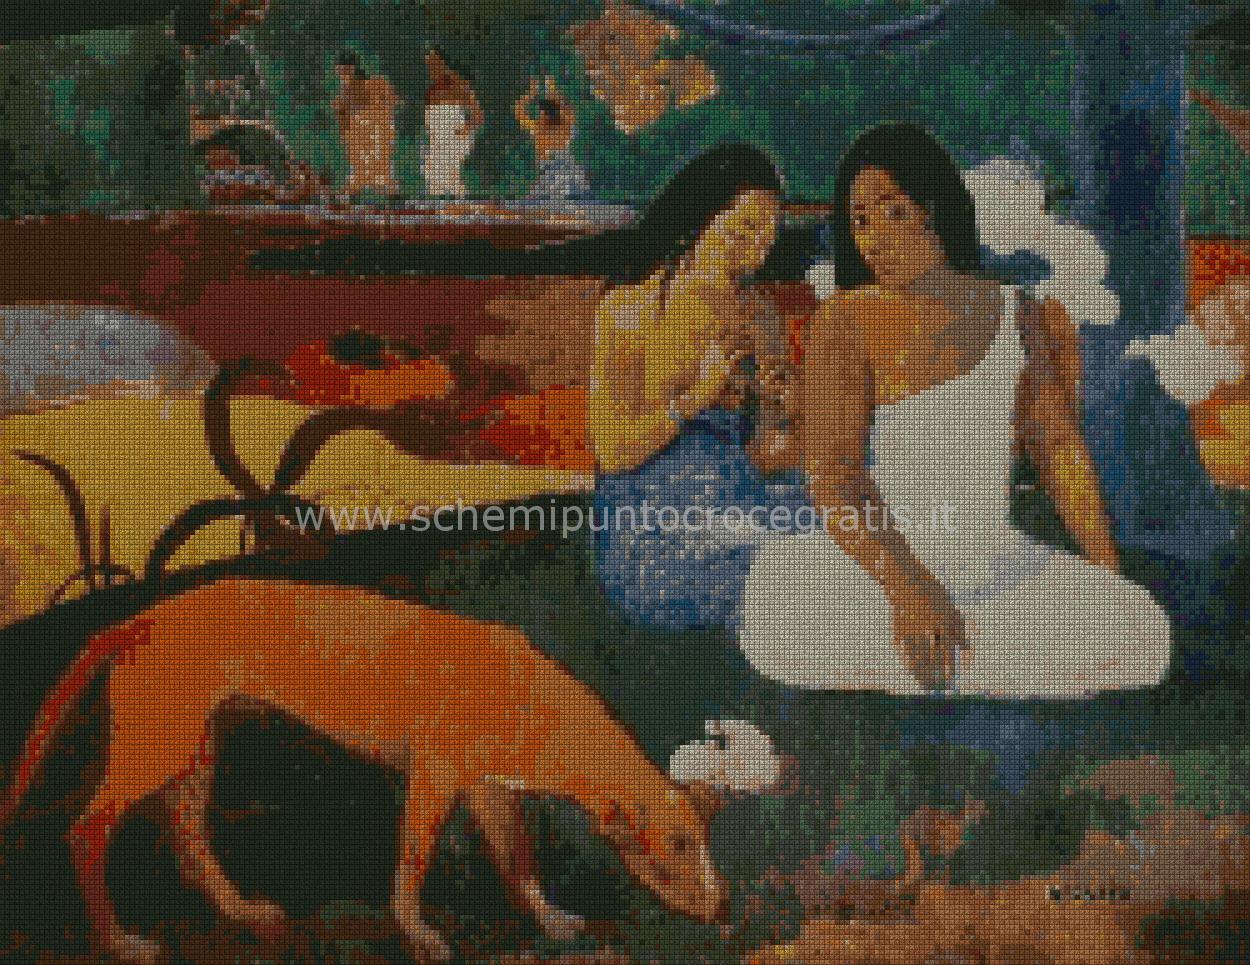 pittori_moderni/gauguin/gauguin00.jpg